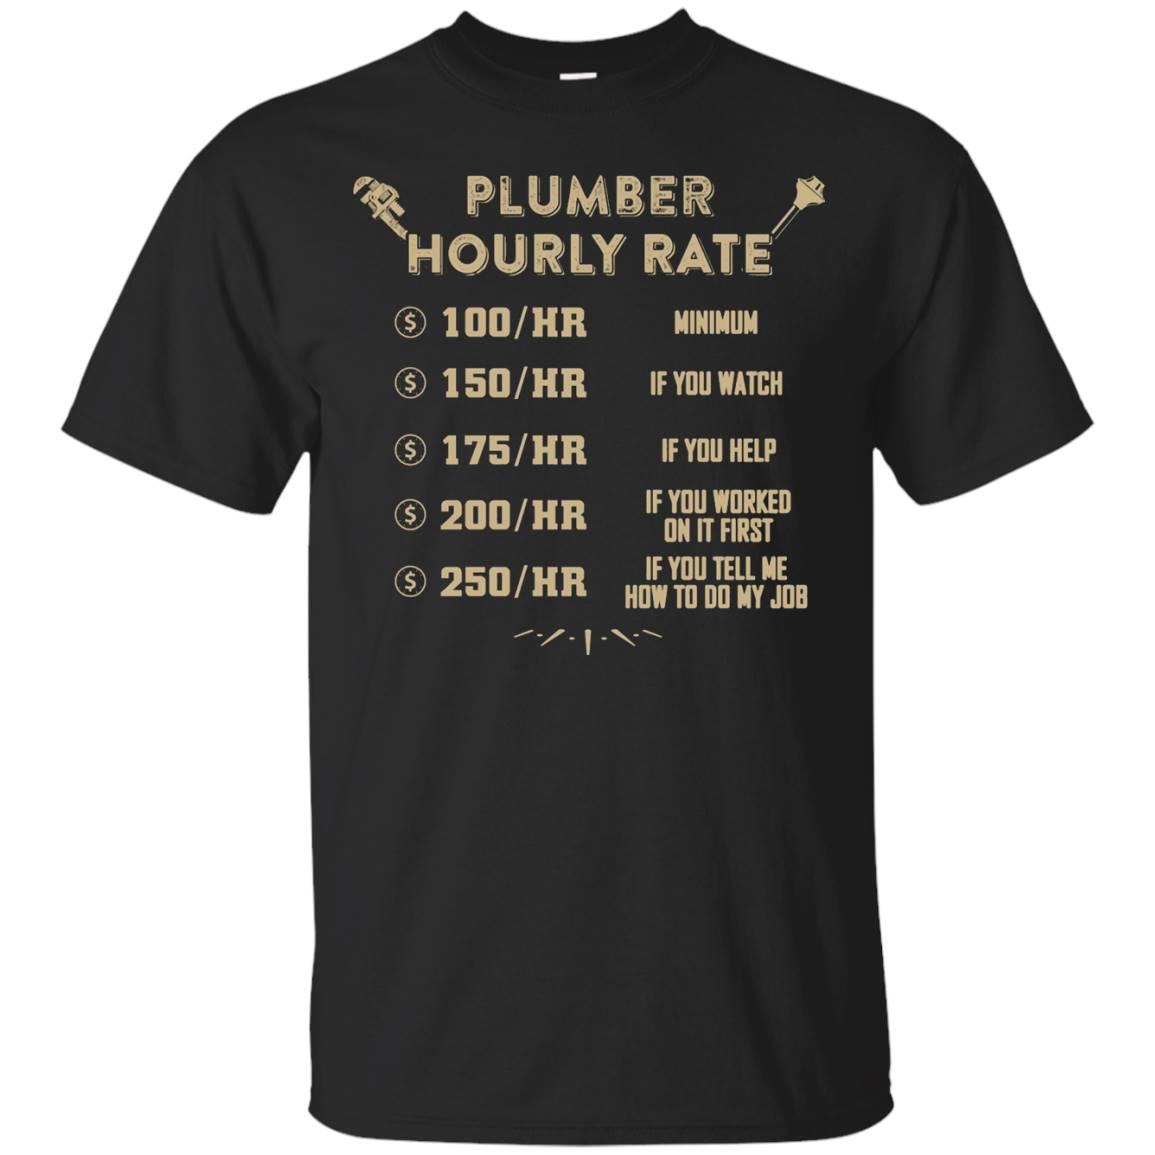 Plumber T-Shirt – Plumber Hourly Rate